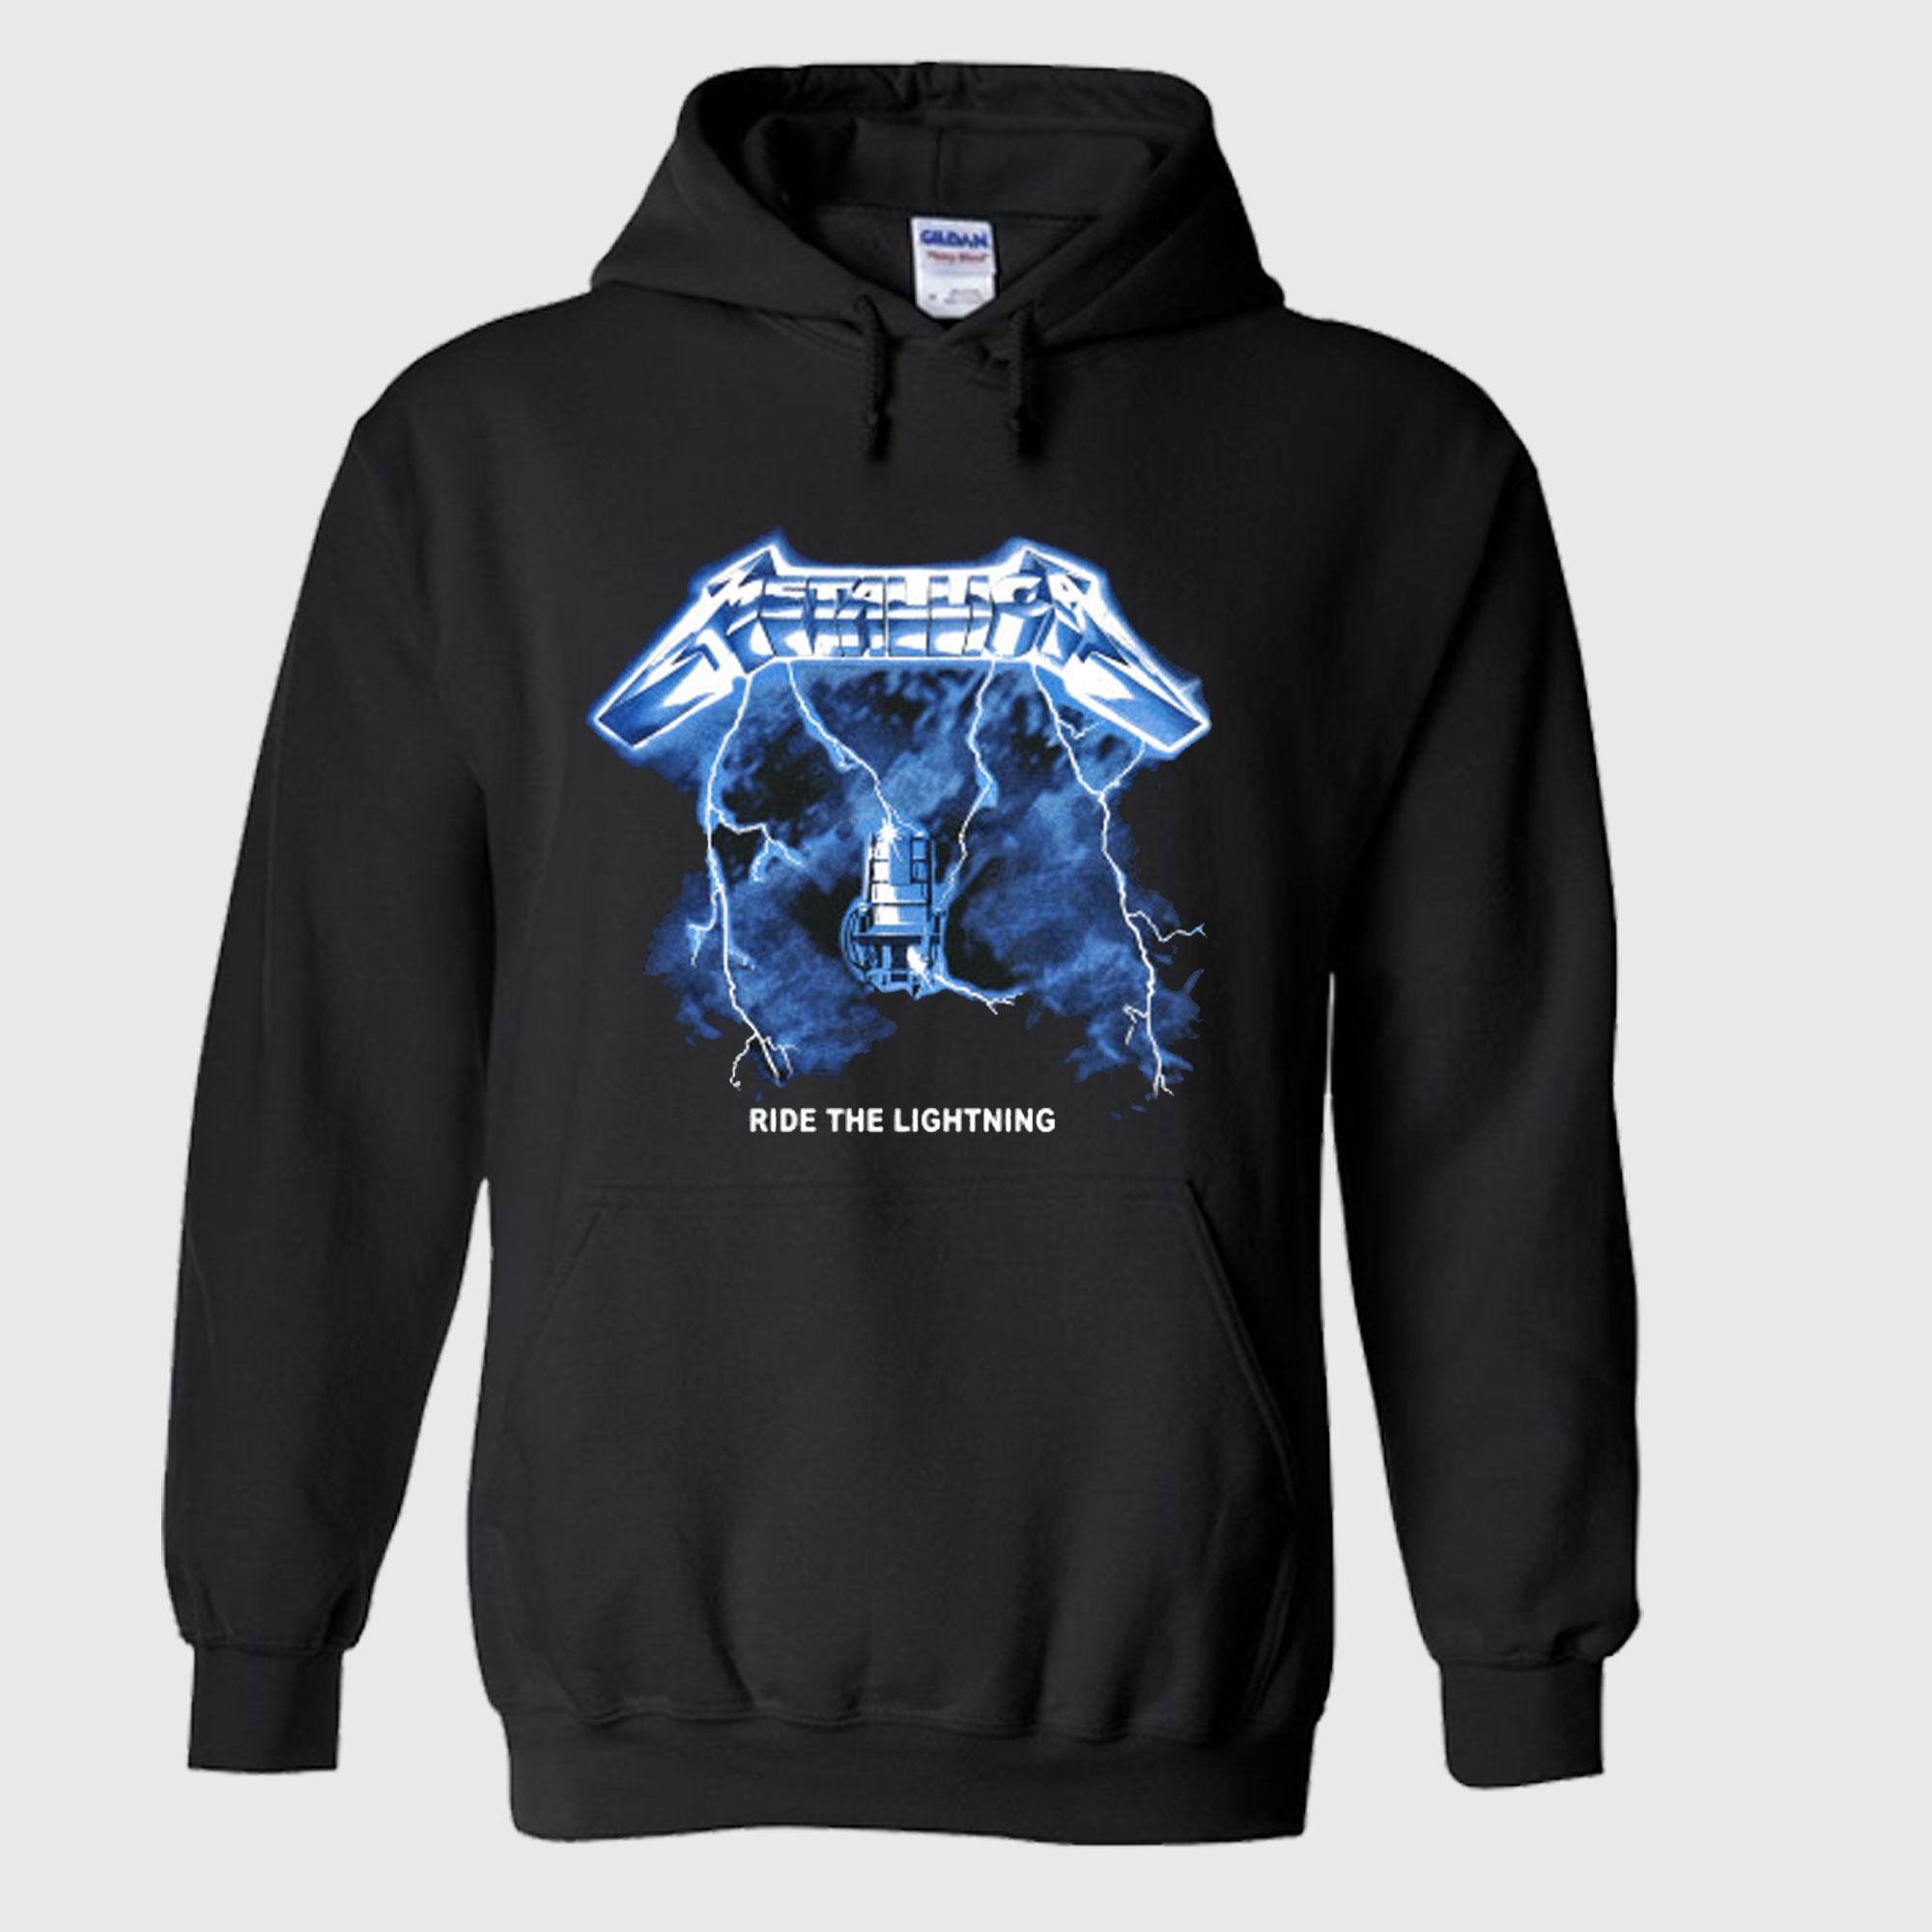 Metallica Ride The Lightning Hoodie